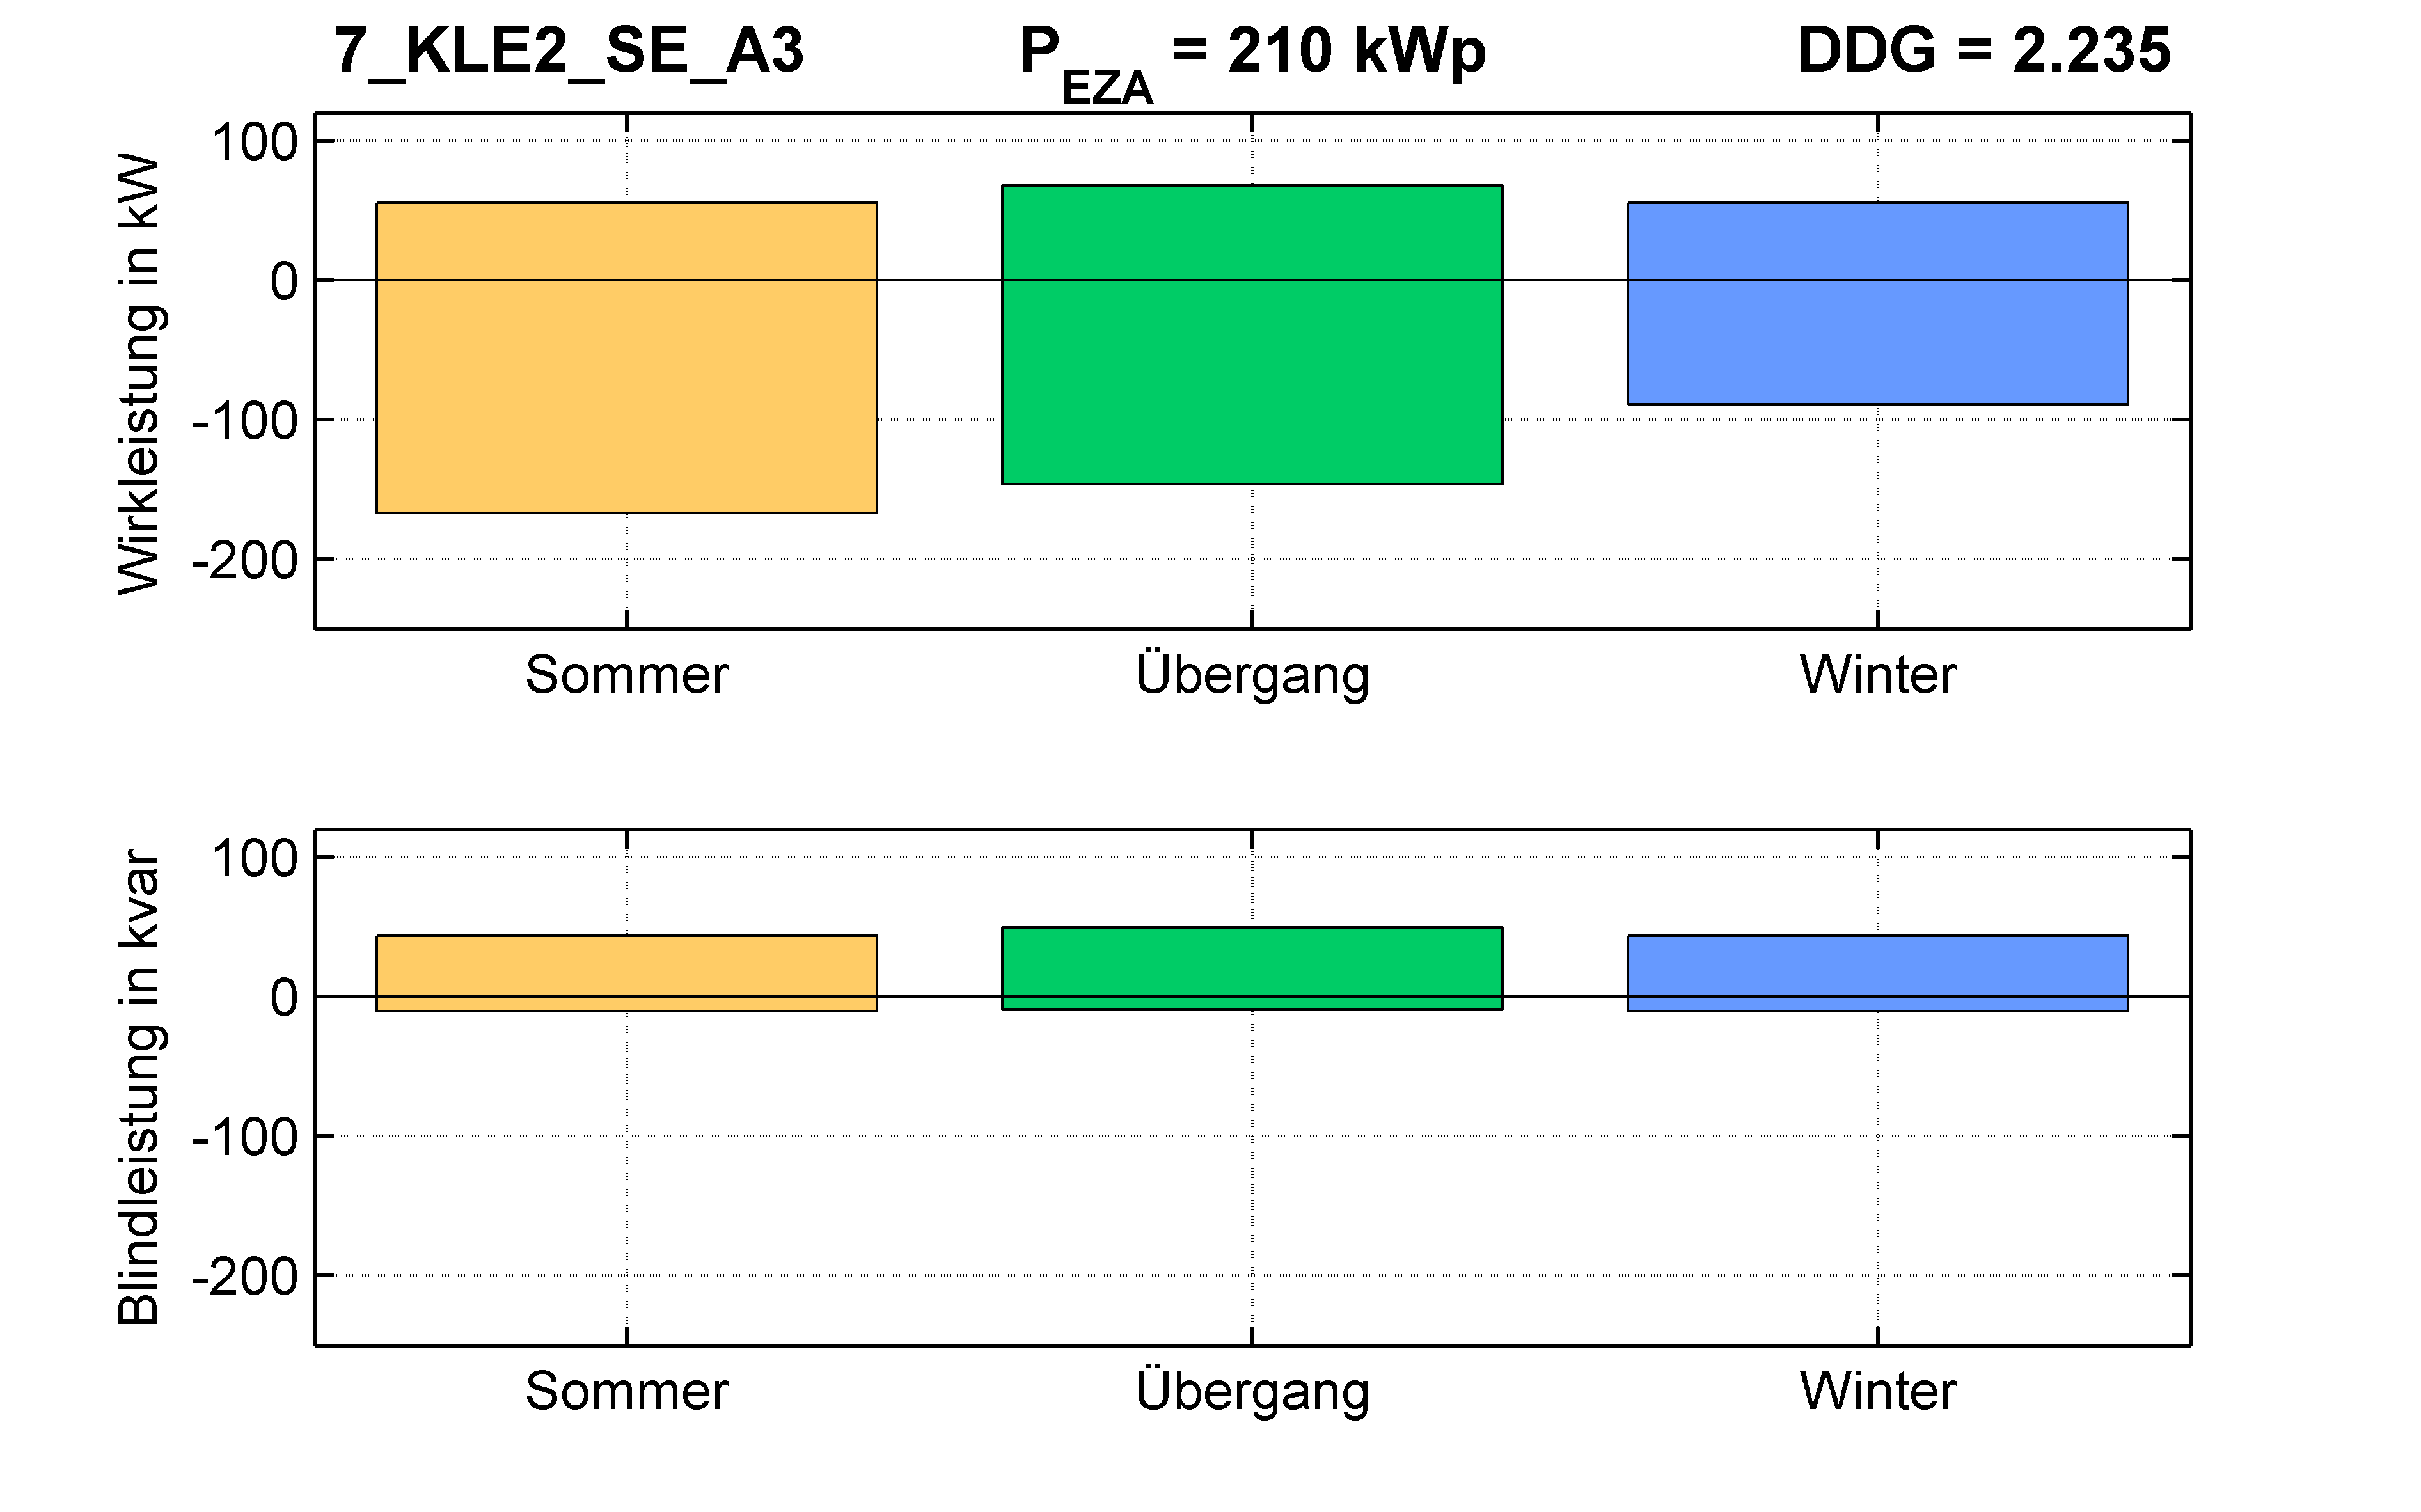 KLE2 | Längsregler (SE) A3 | PQ-Bilanz